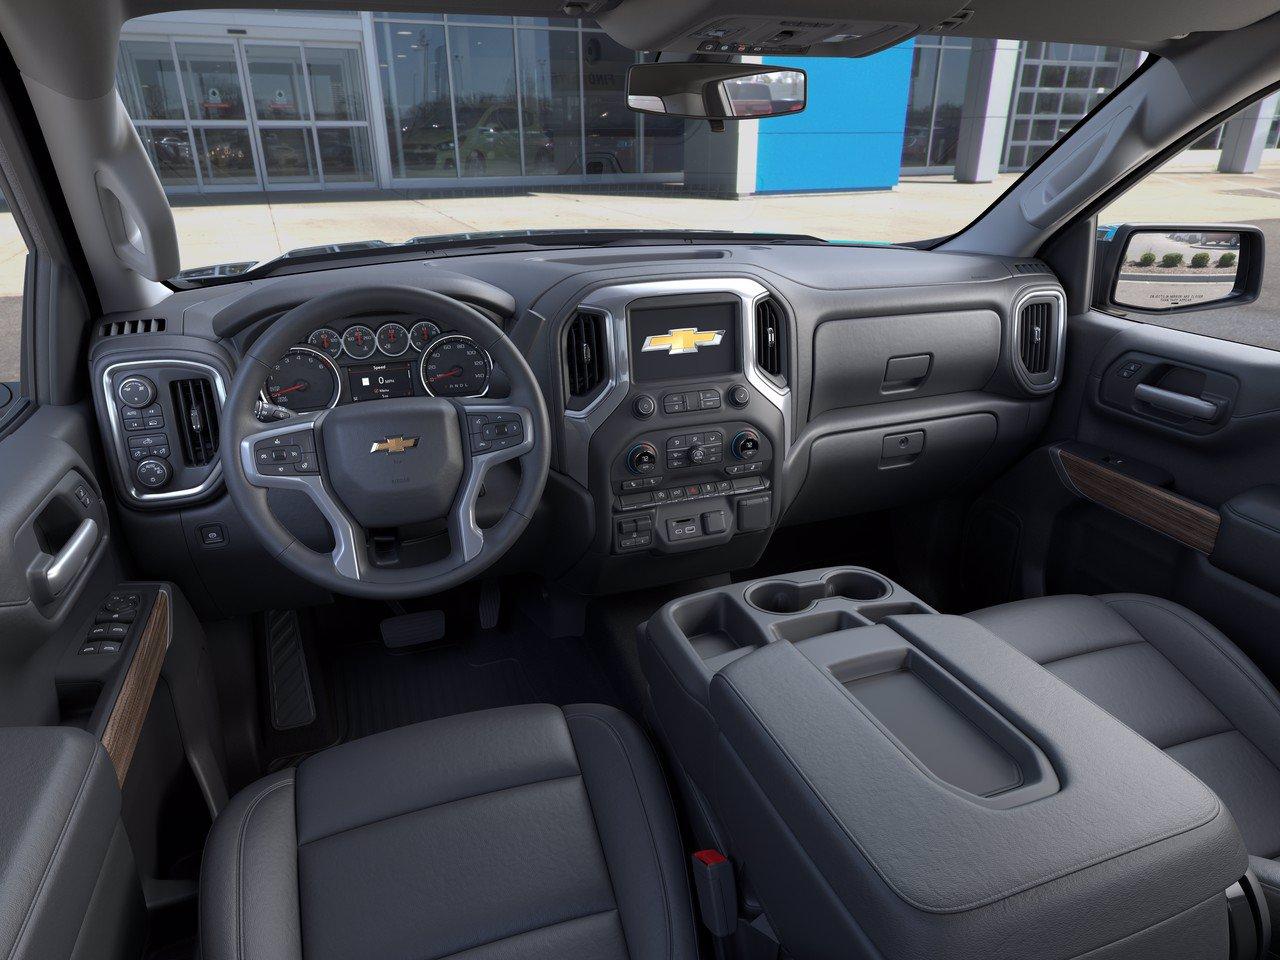 2020 Chevrolet Silverado 1500 Crew Cab 4x4, Pickup #C201419 - photo 10